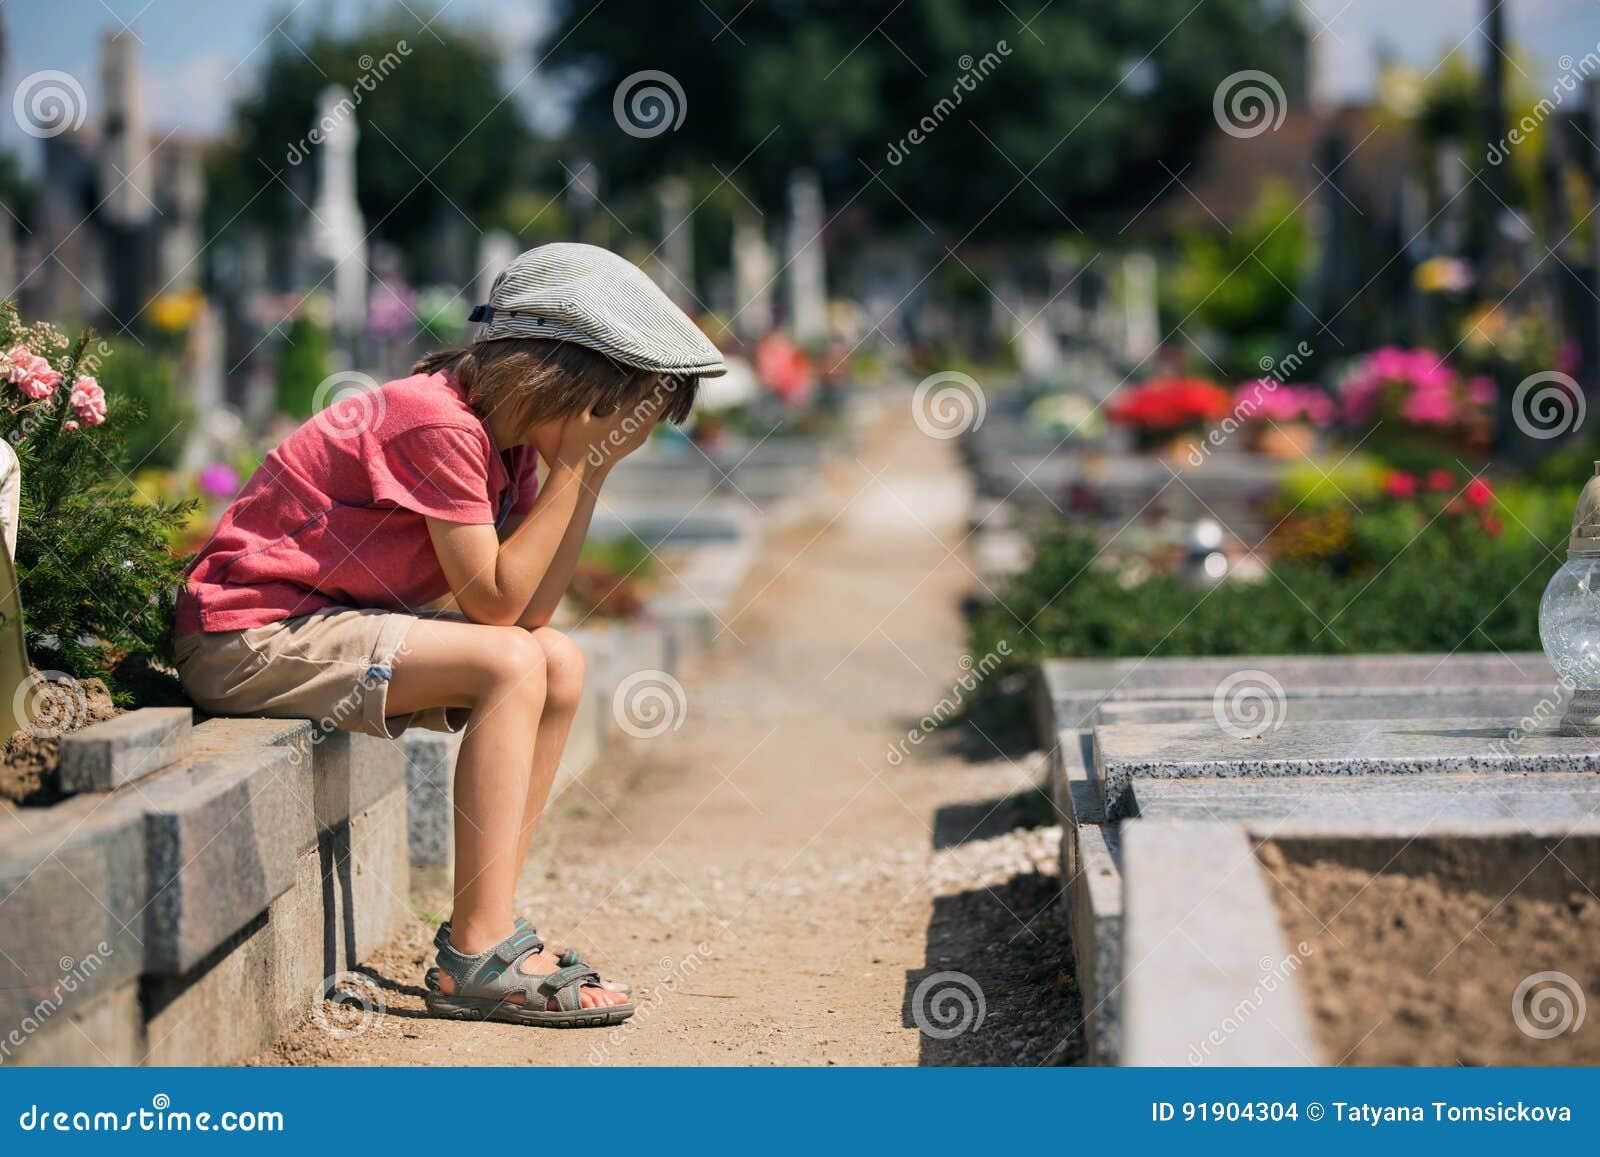 Sad little boy, sitting on a grave in a cemetery, feeling sad